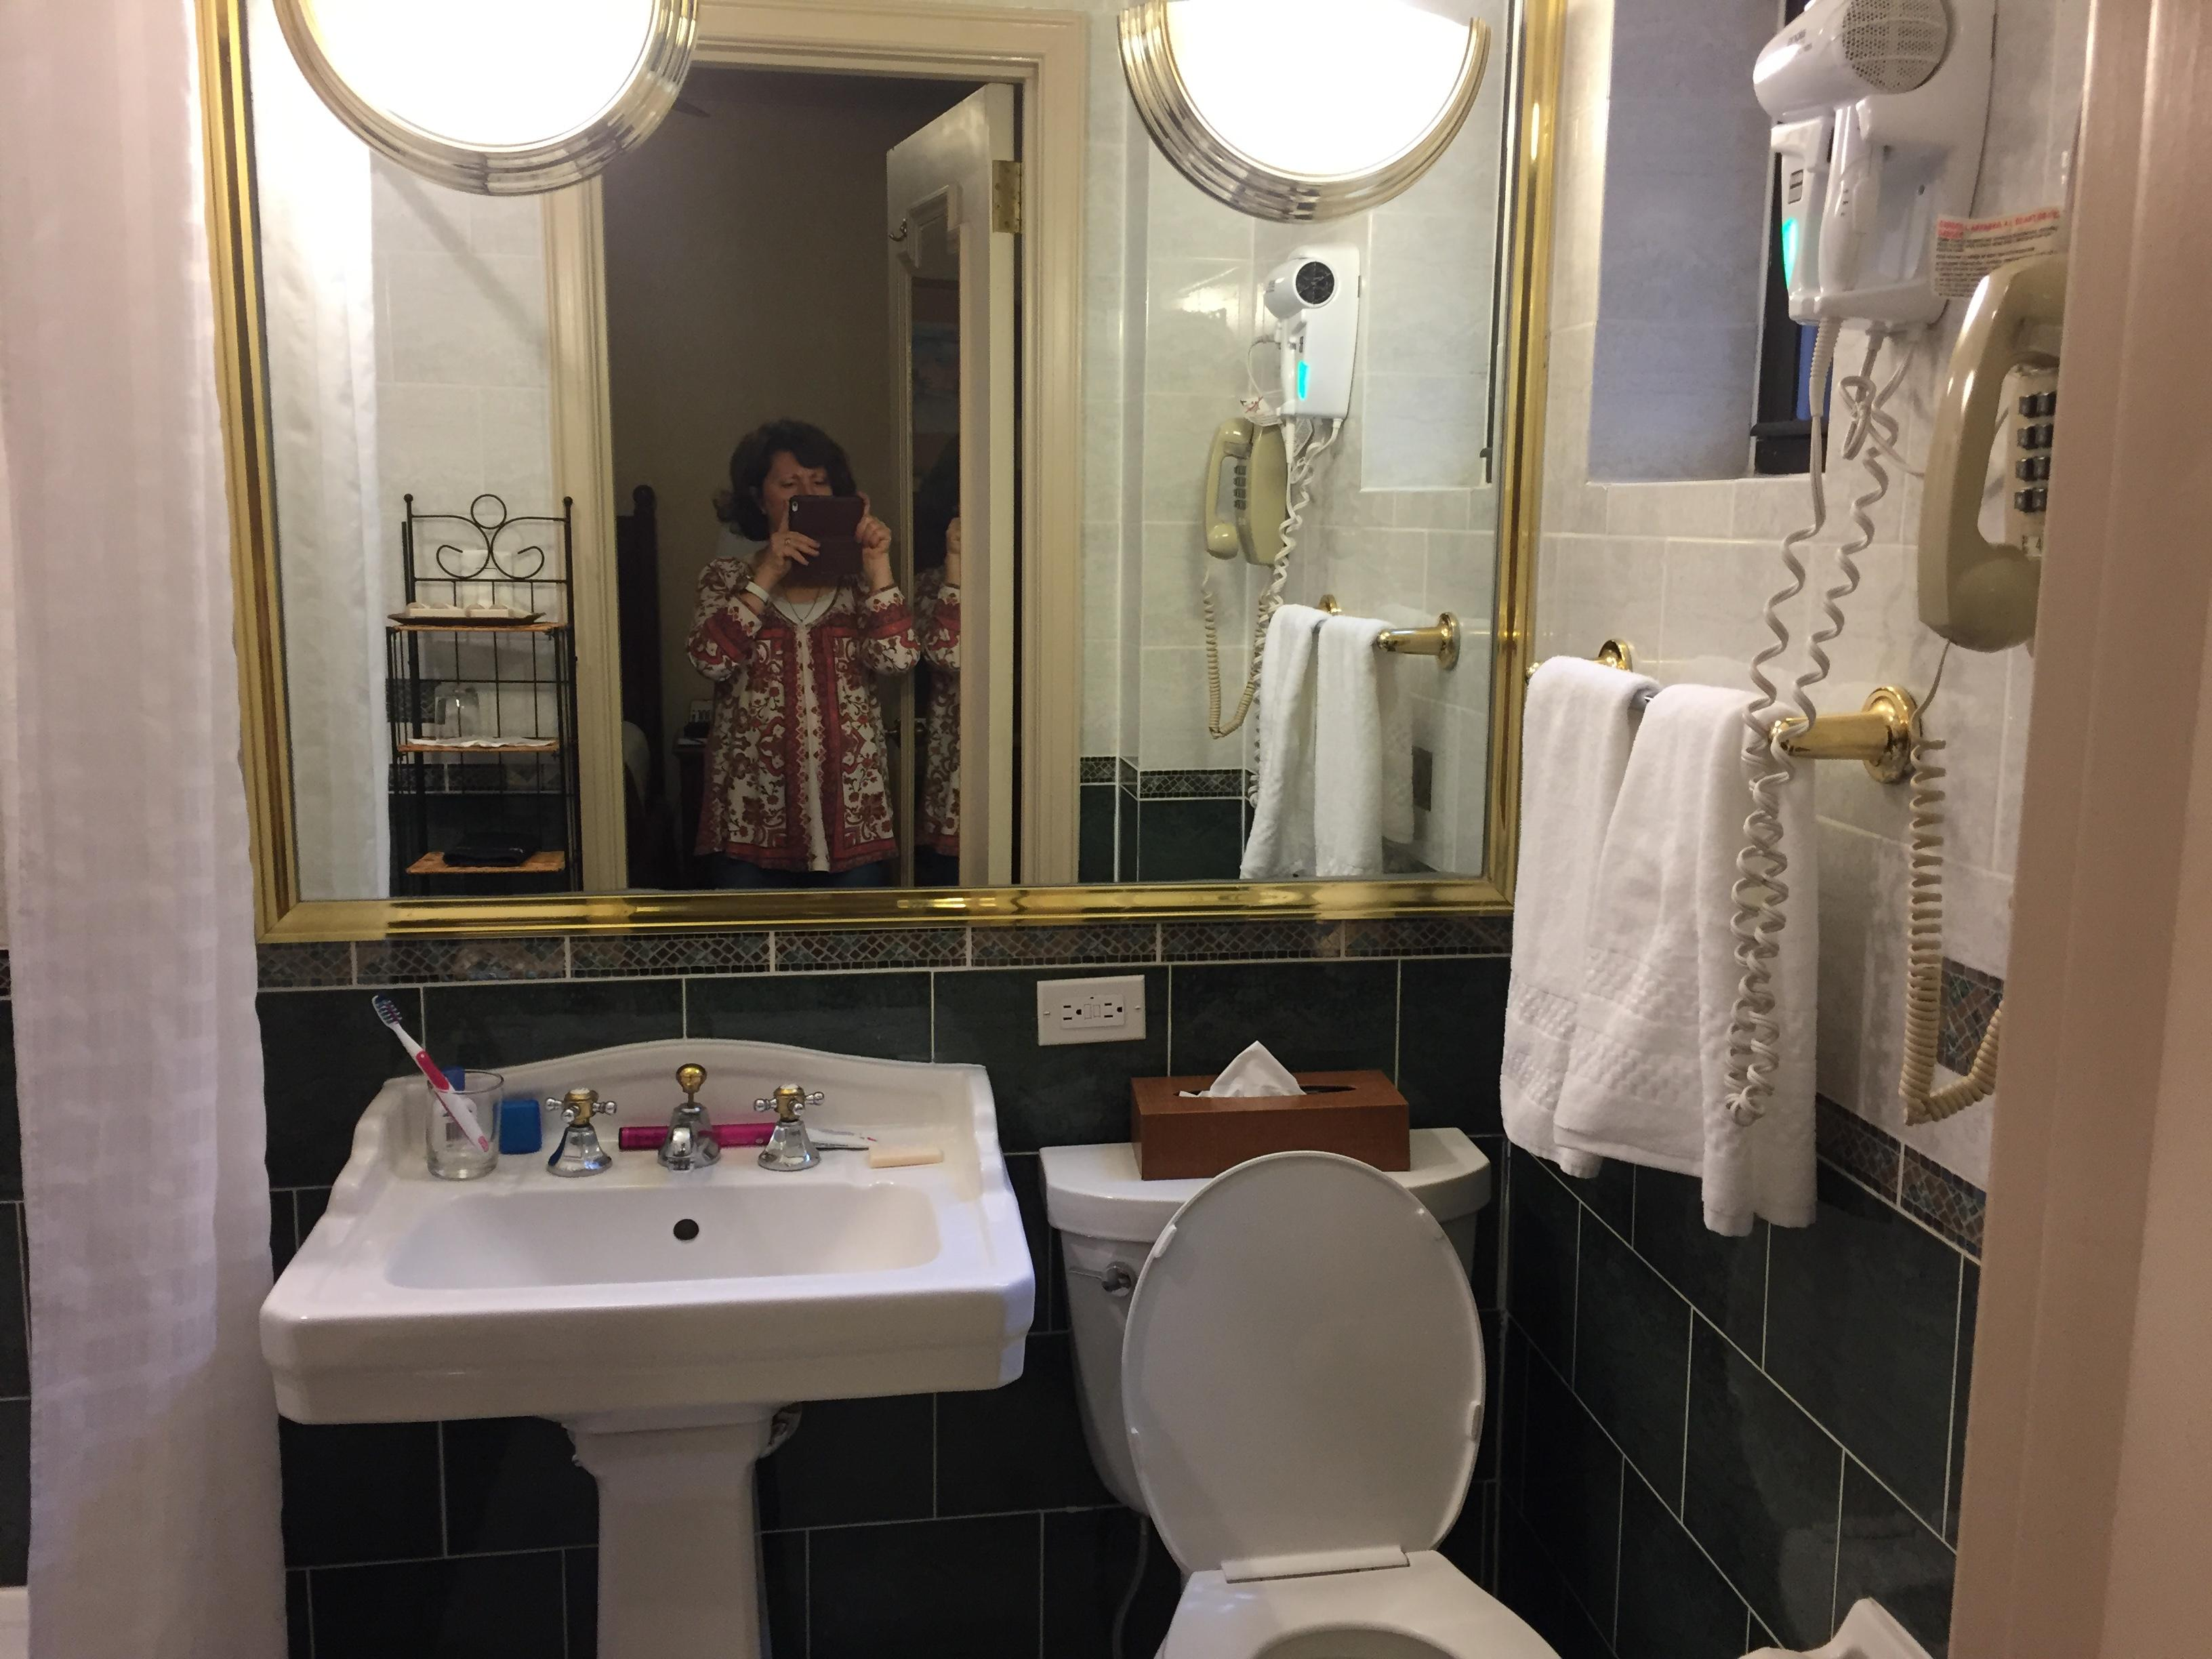 Tidy but tight bathroom